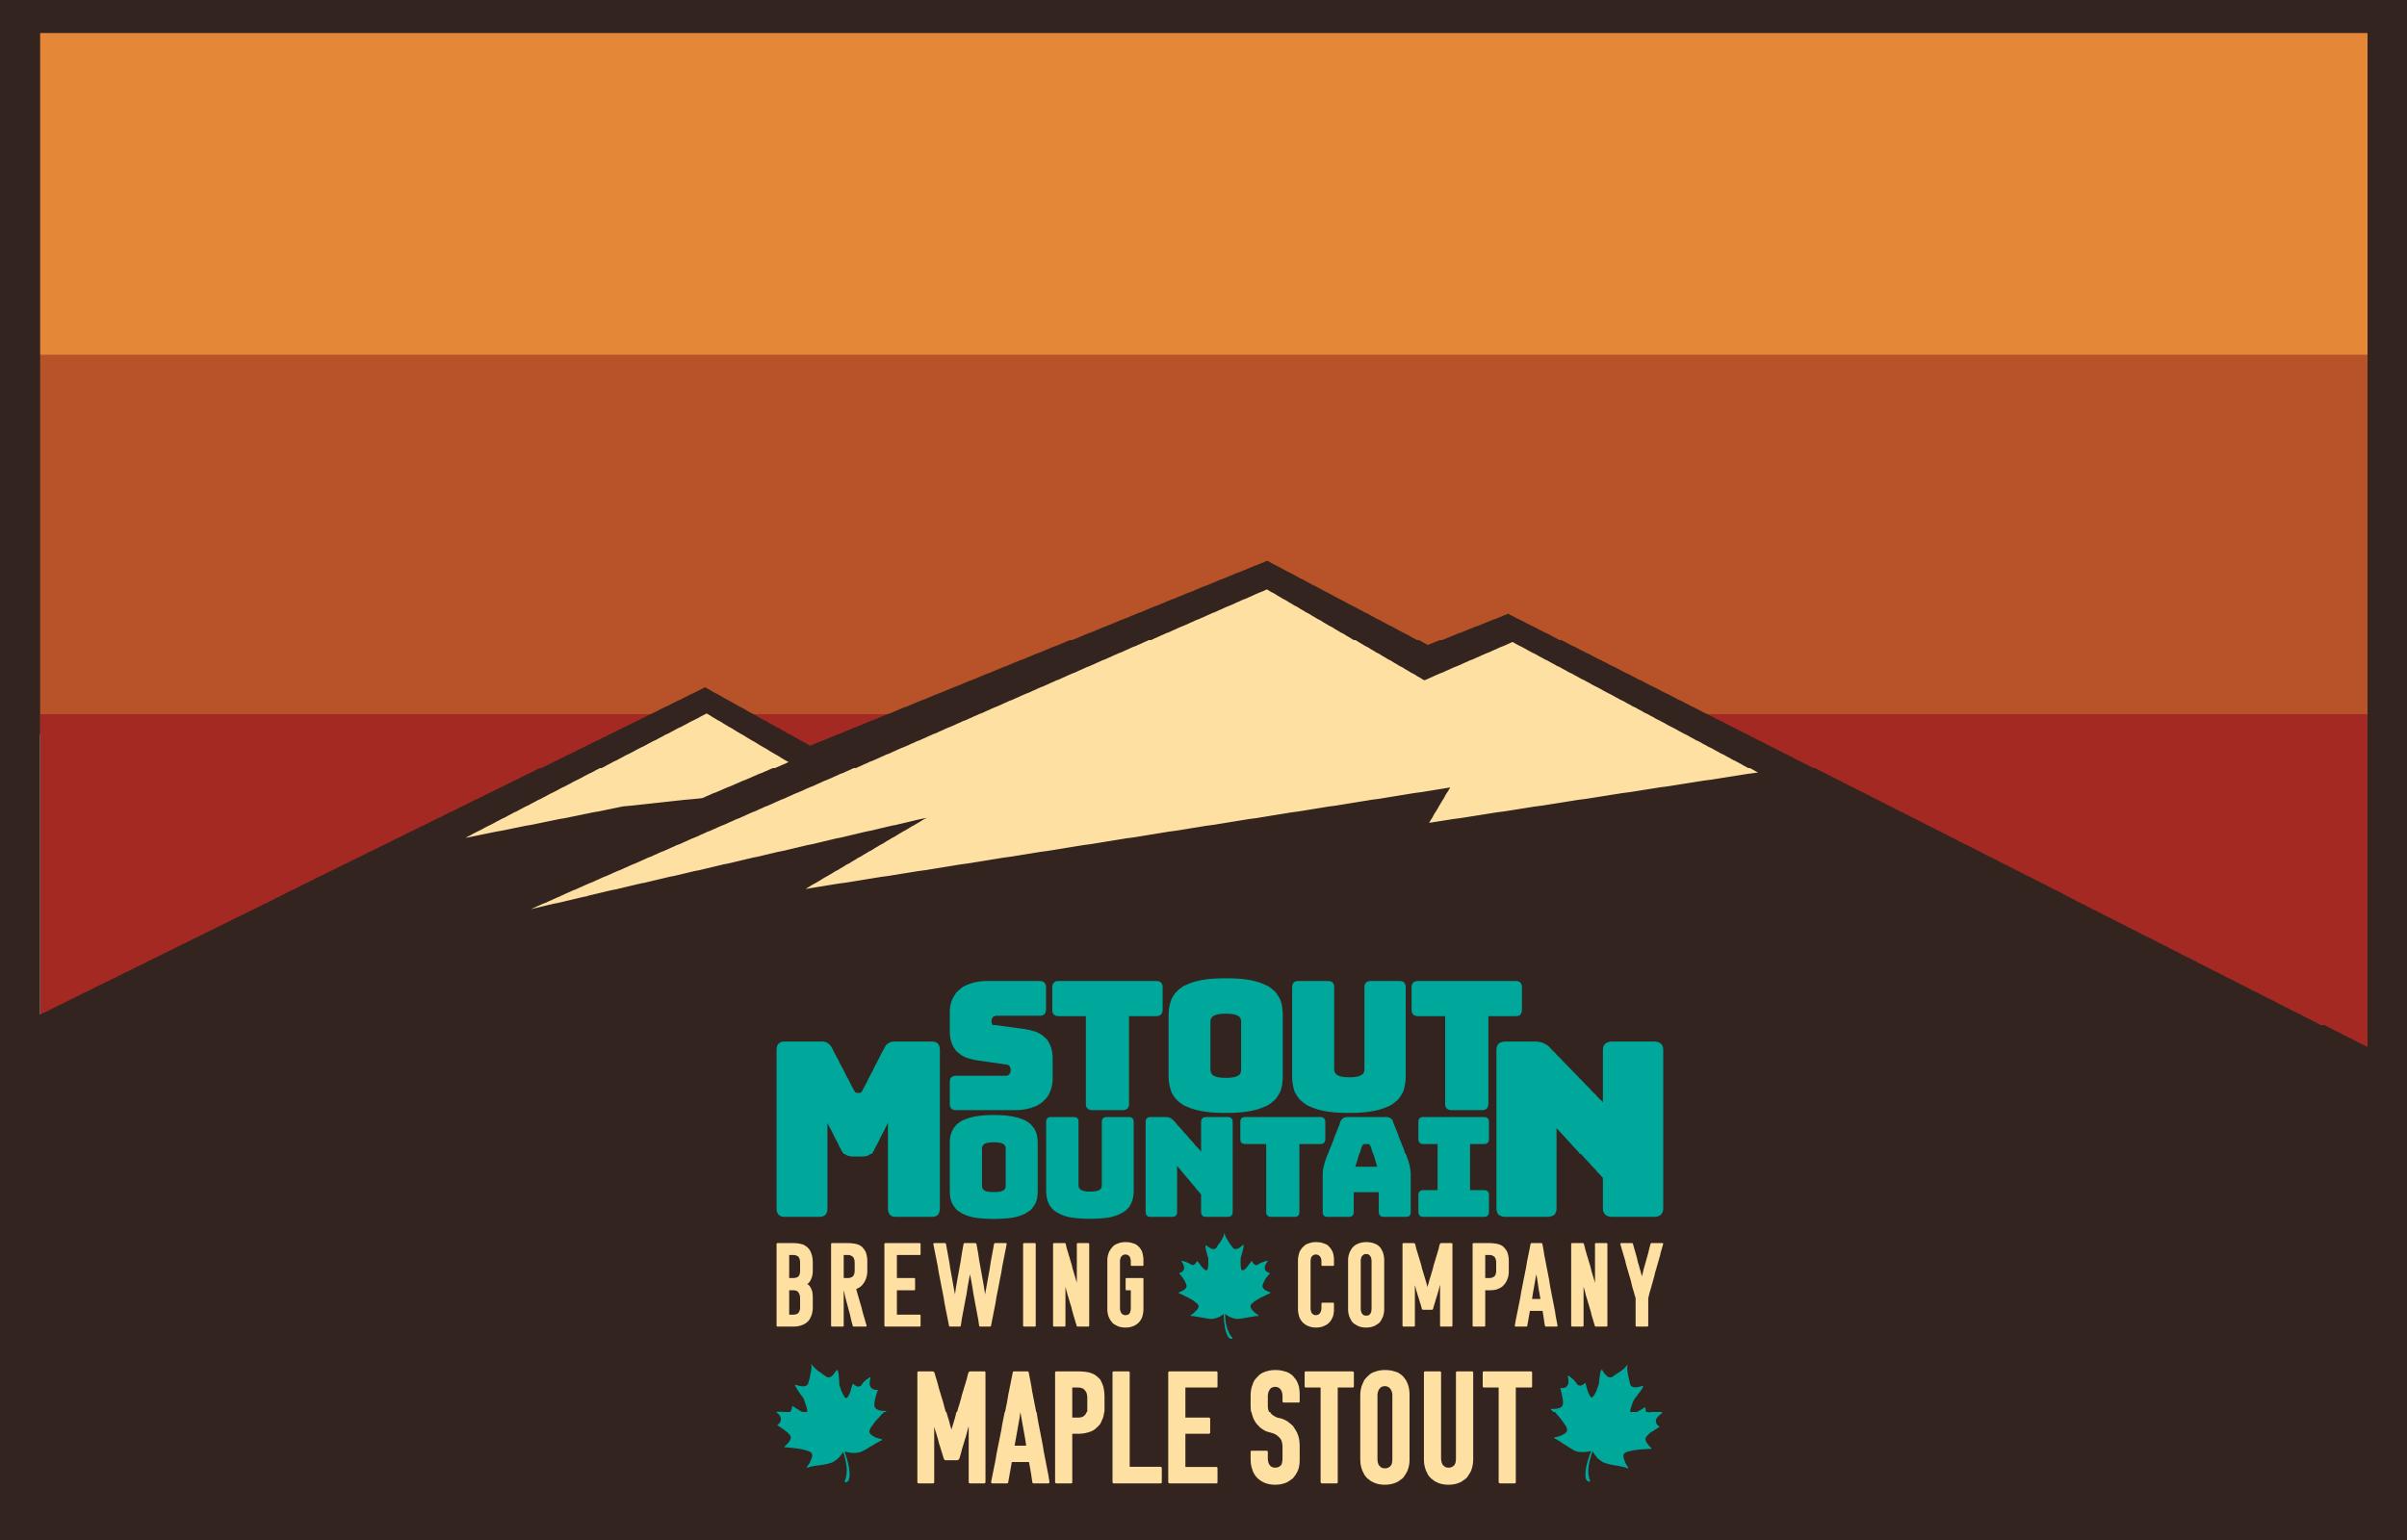 Stout Mountain Brewing Company